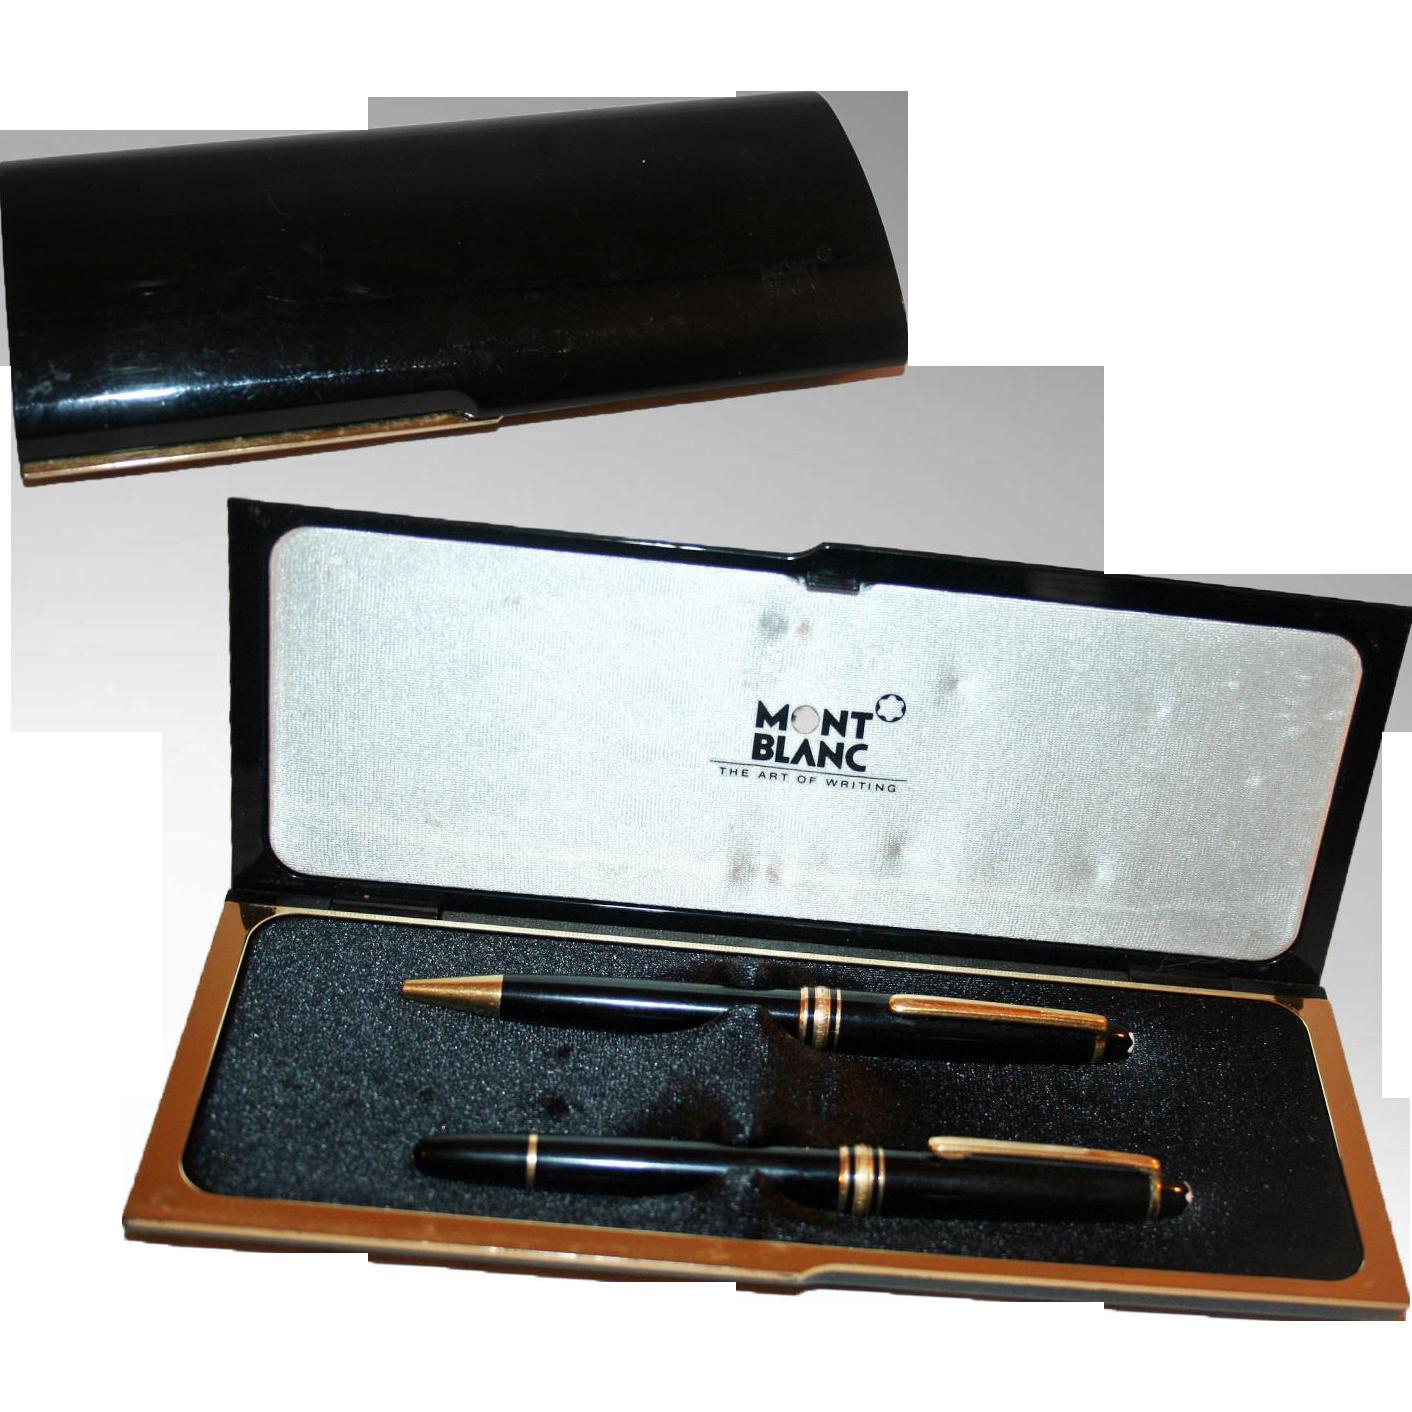 mont banc meisterstuck set fountain pen ball point pen in original from homefarmantiques on. Black Bedroom Furniture Sets. Home Design Ideas